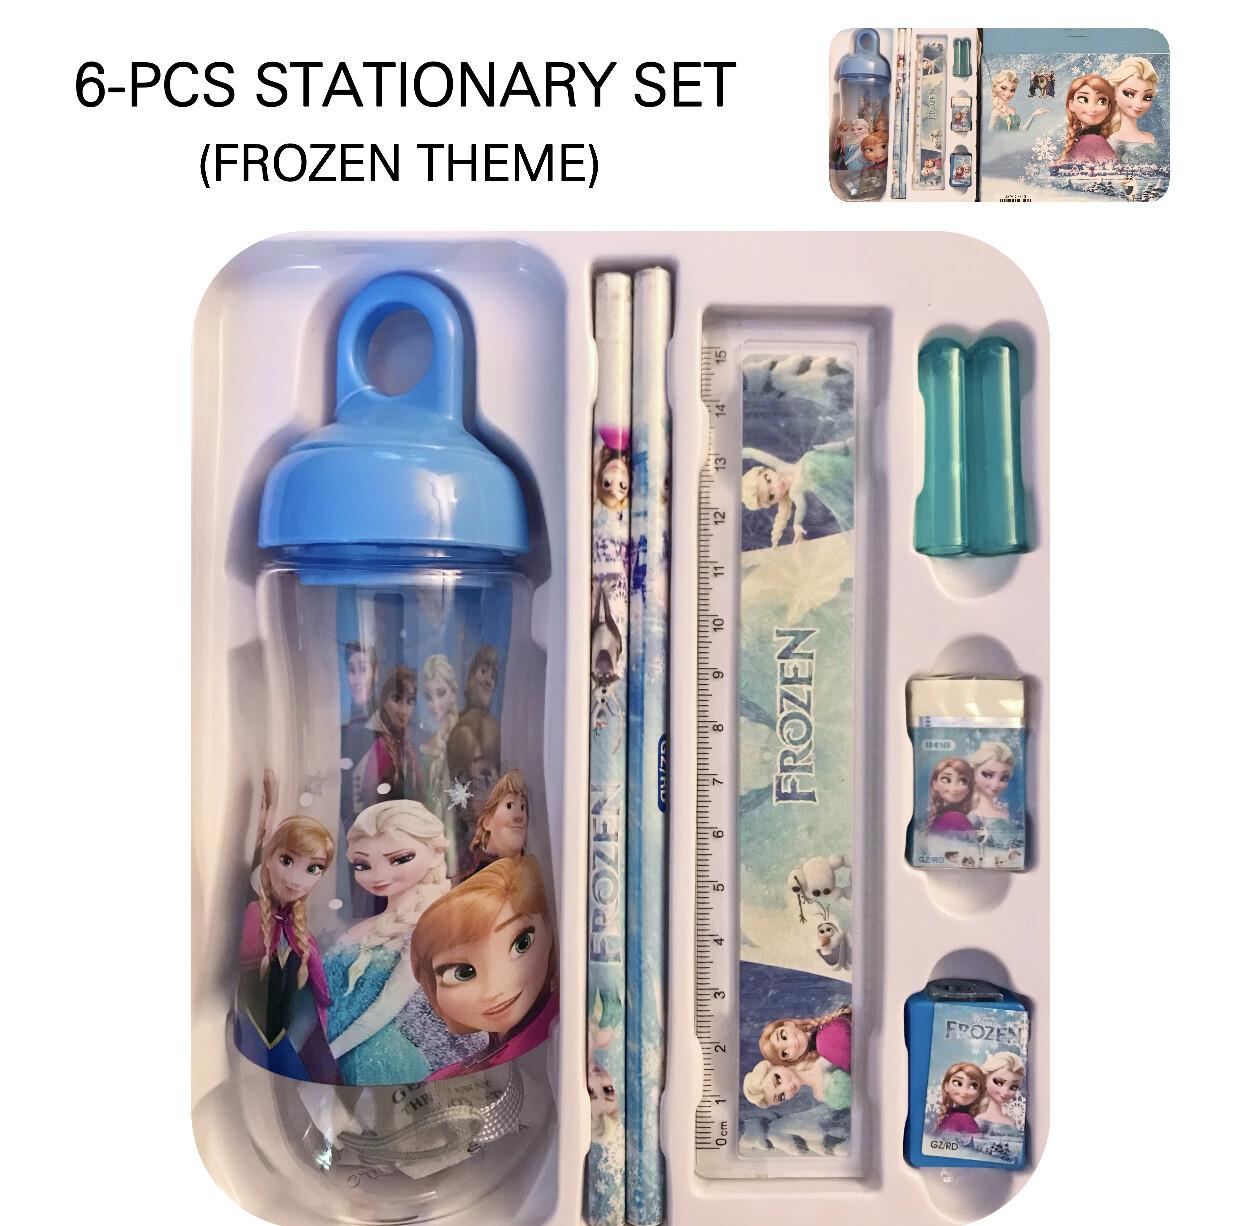 6-Pcs Stationery Set